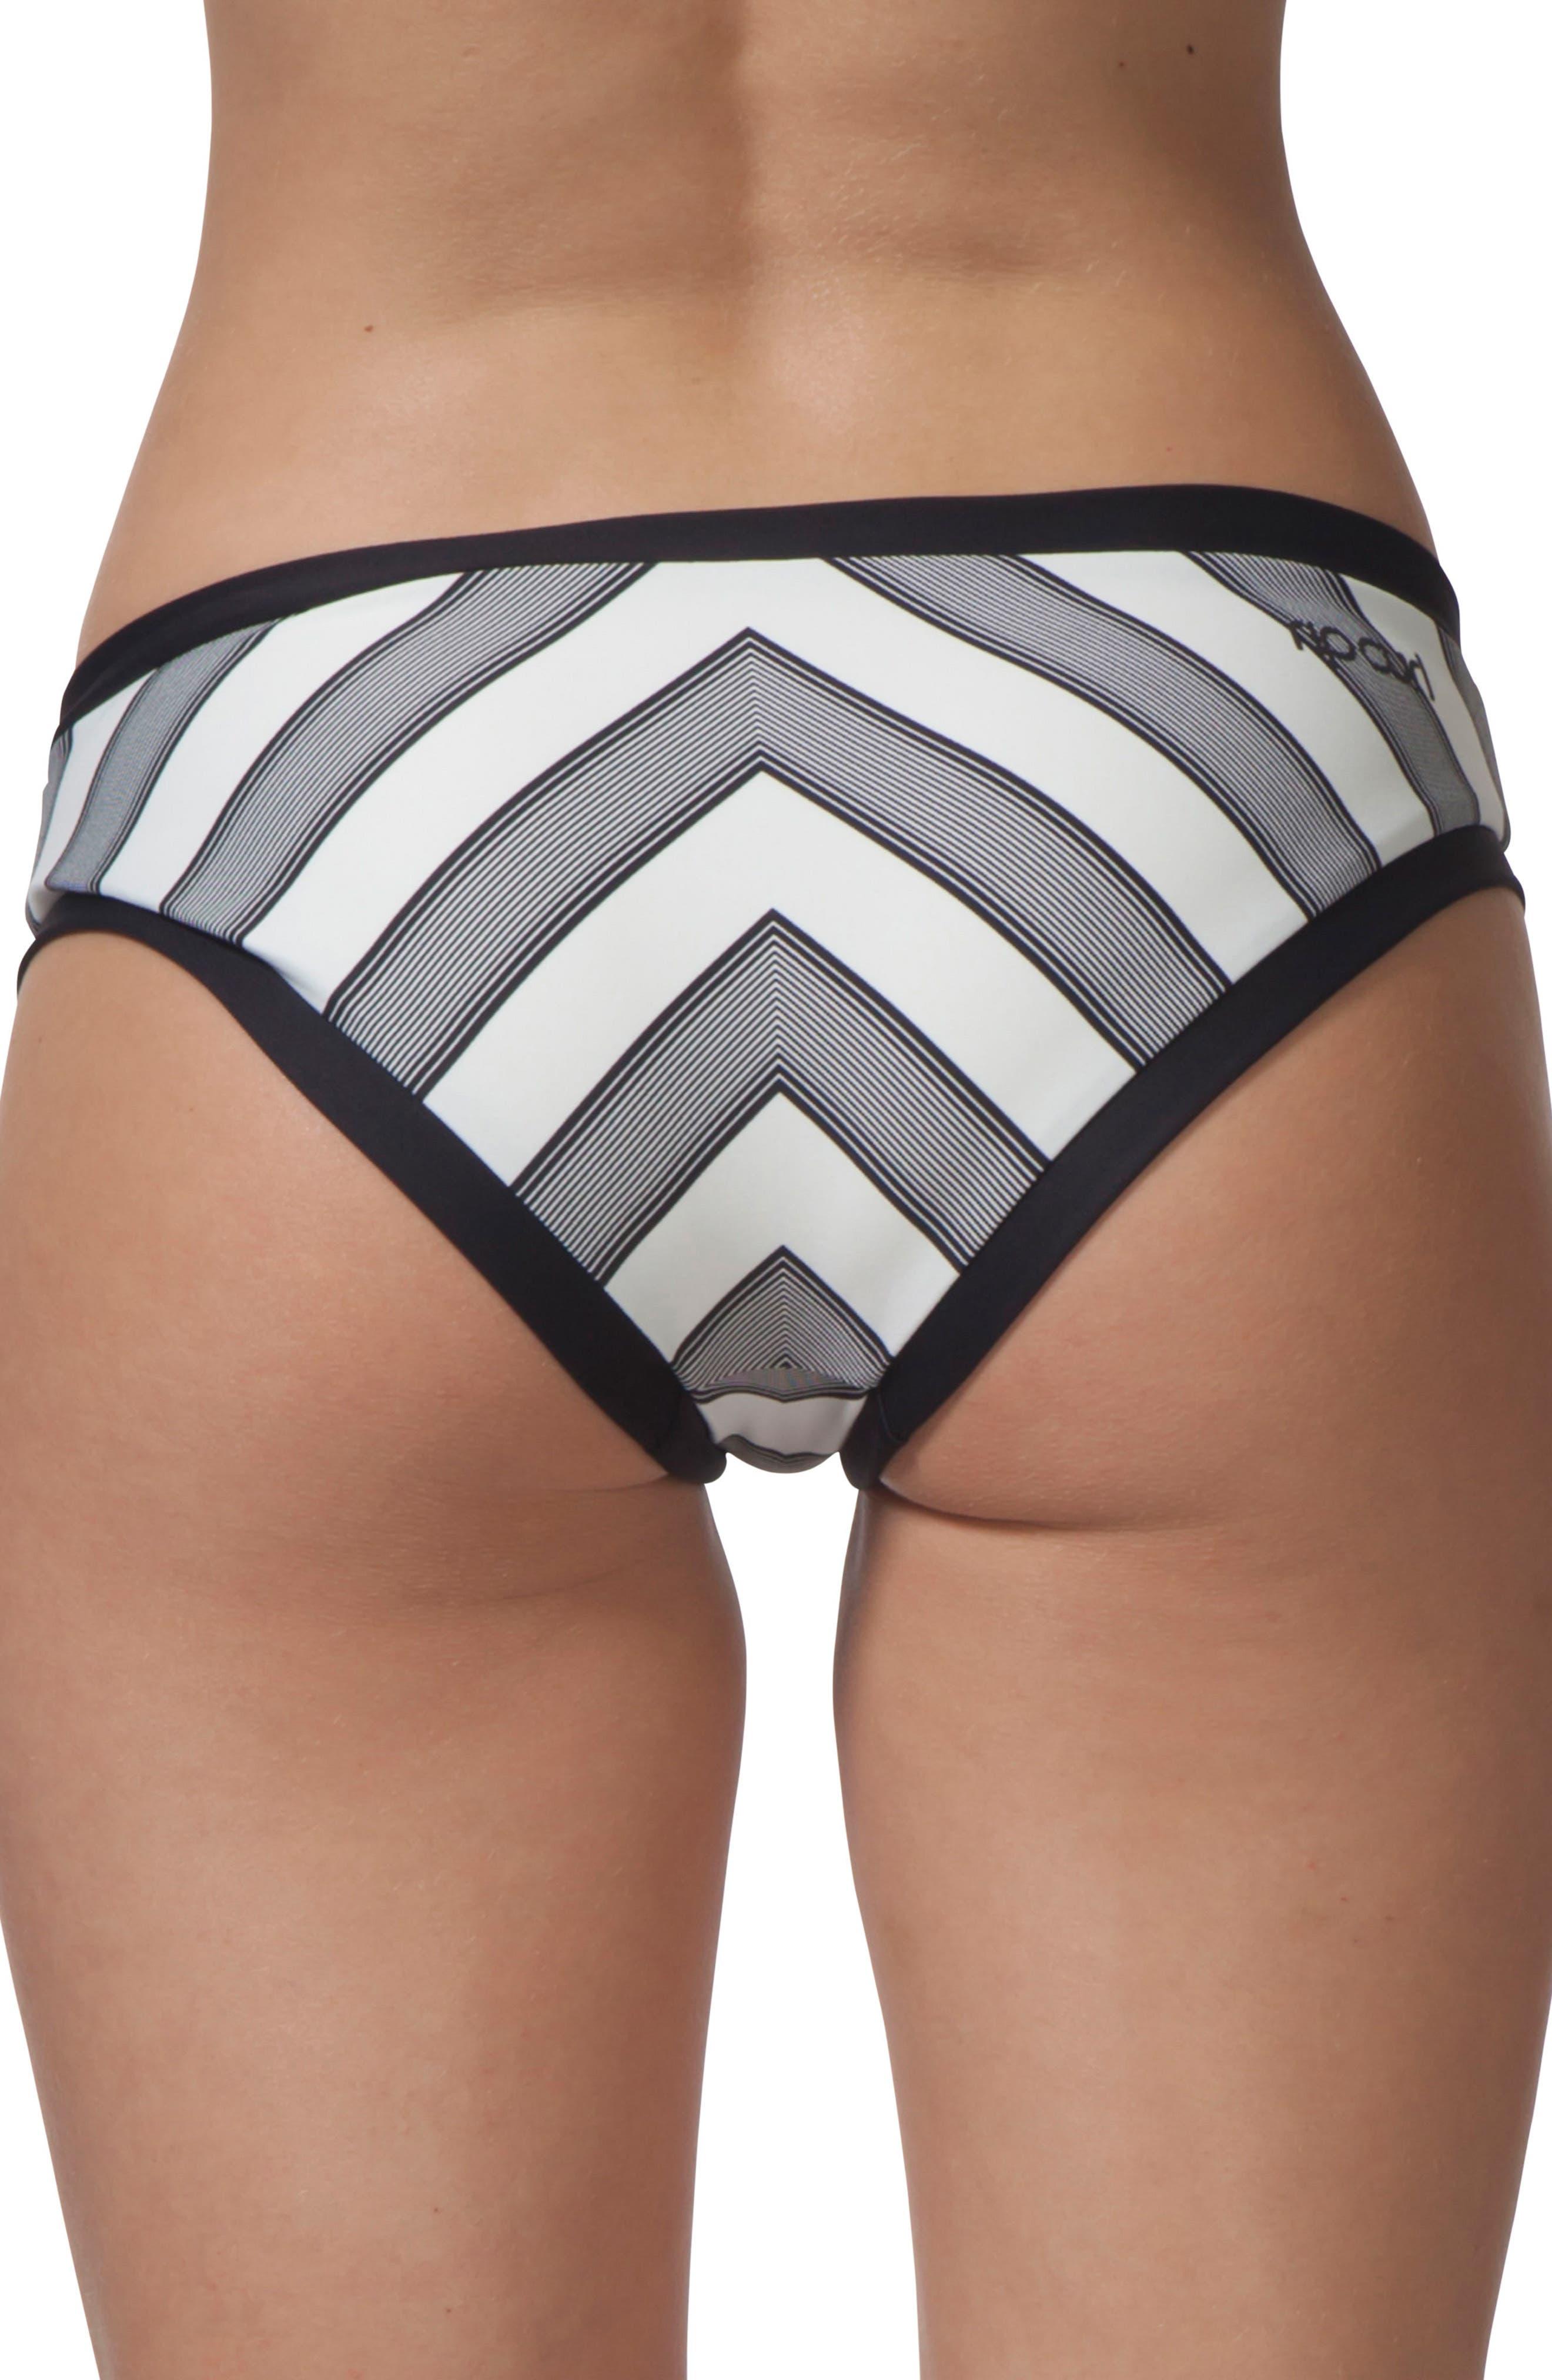 Mirage Line Up Hipster Bikini Bottoms,                             Alternate thumbnail 2, color,                             001